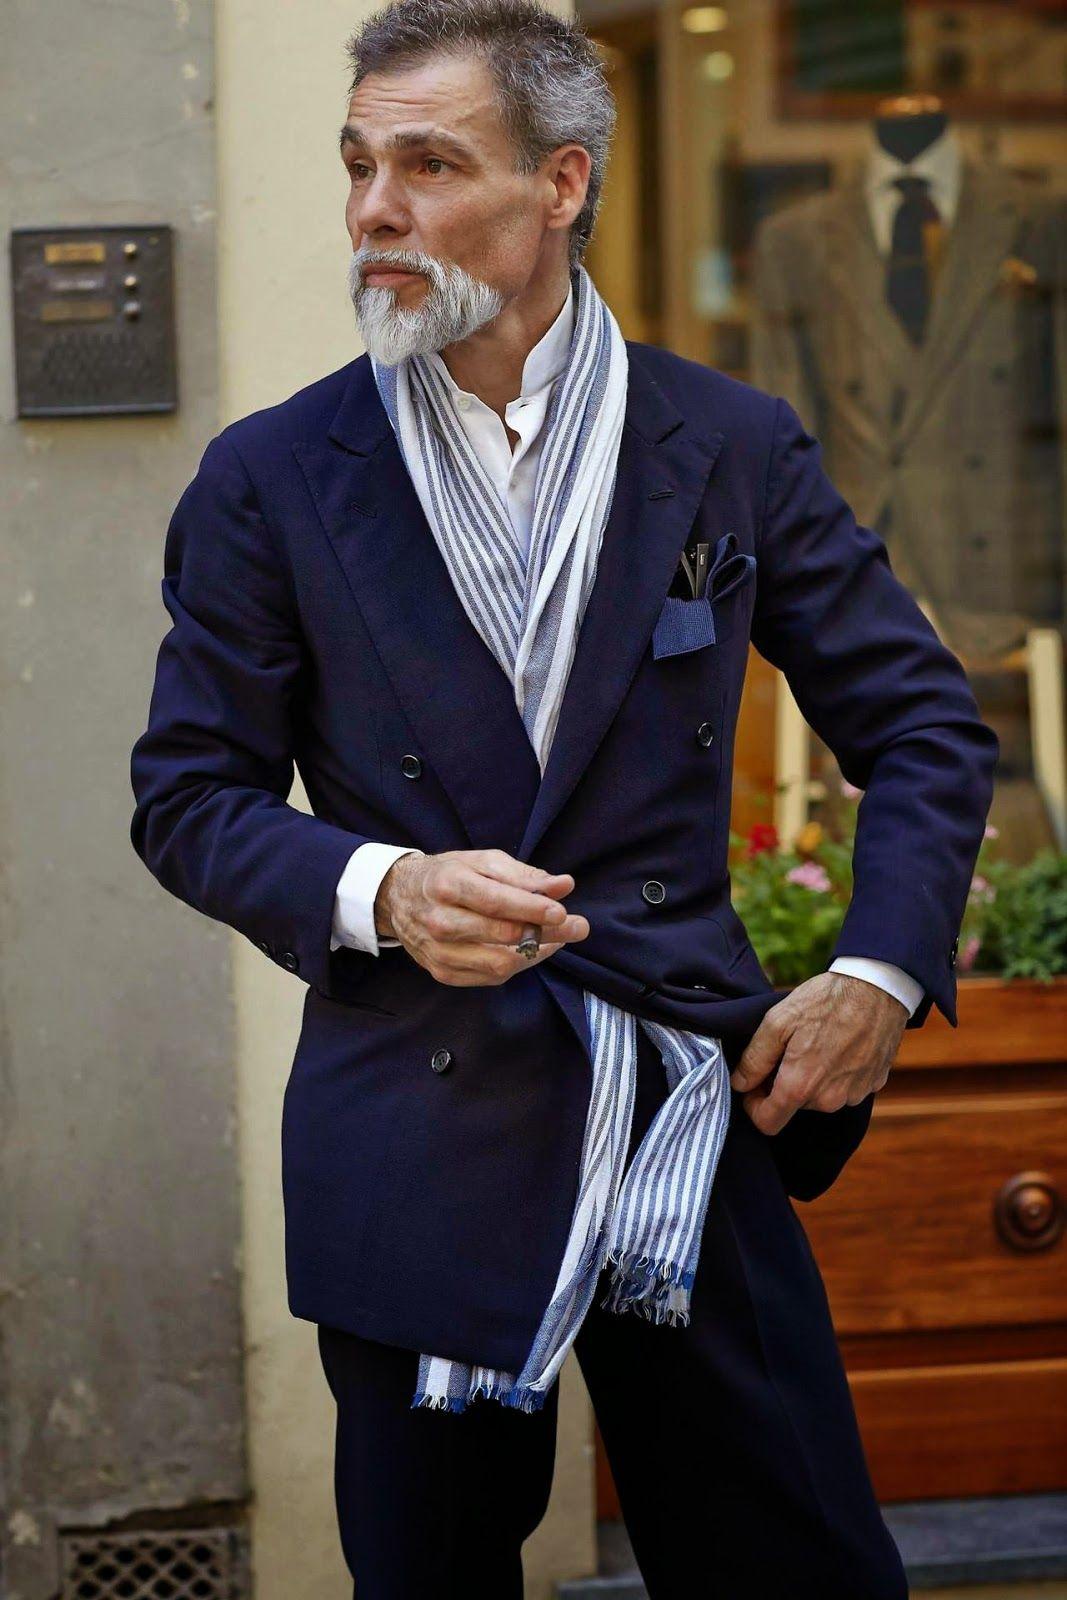 Menswear staple - The scarf